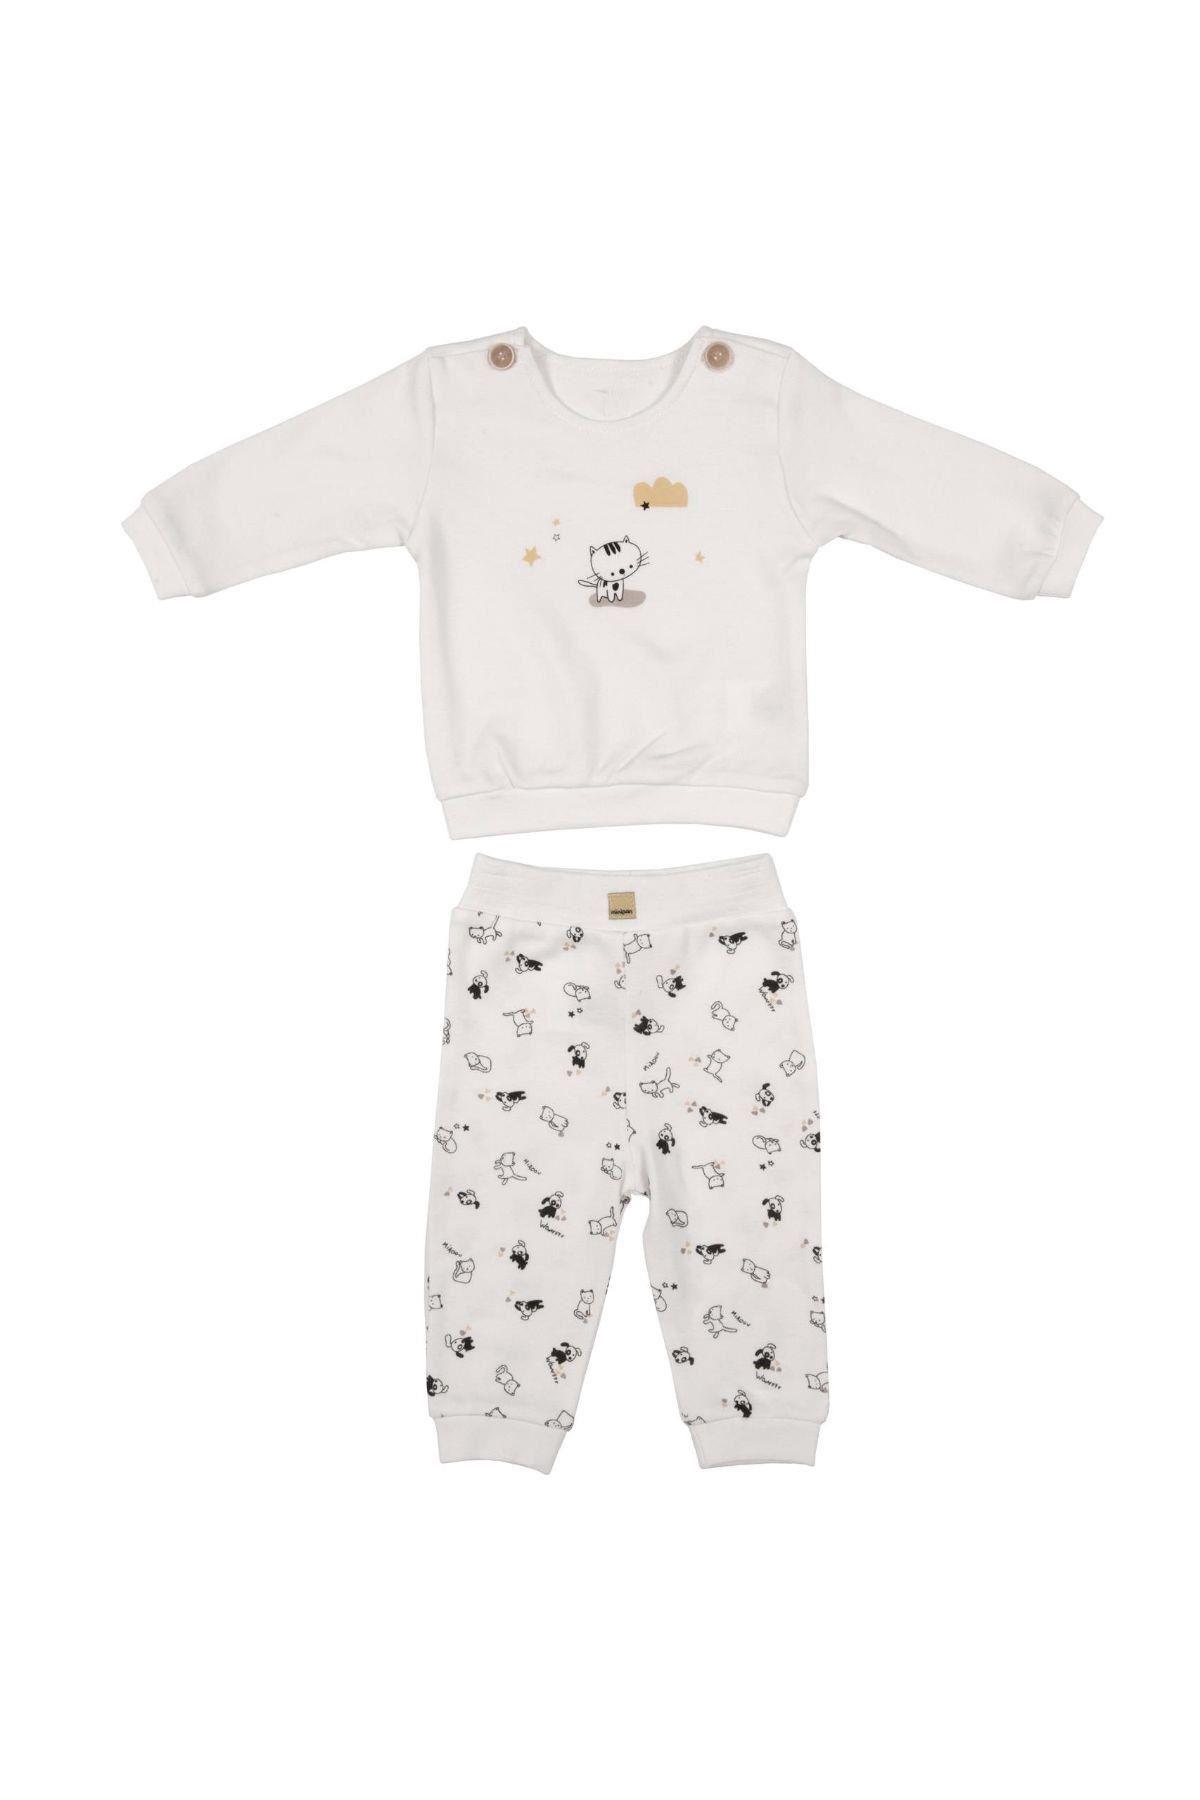 Bebepan Pets 2'li Bebe Takım 2058 Orjinal